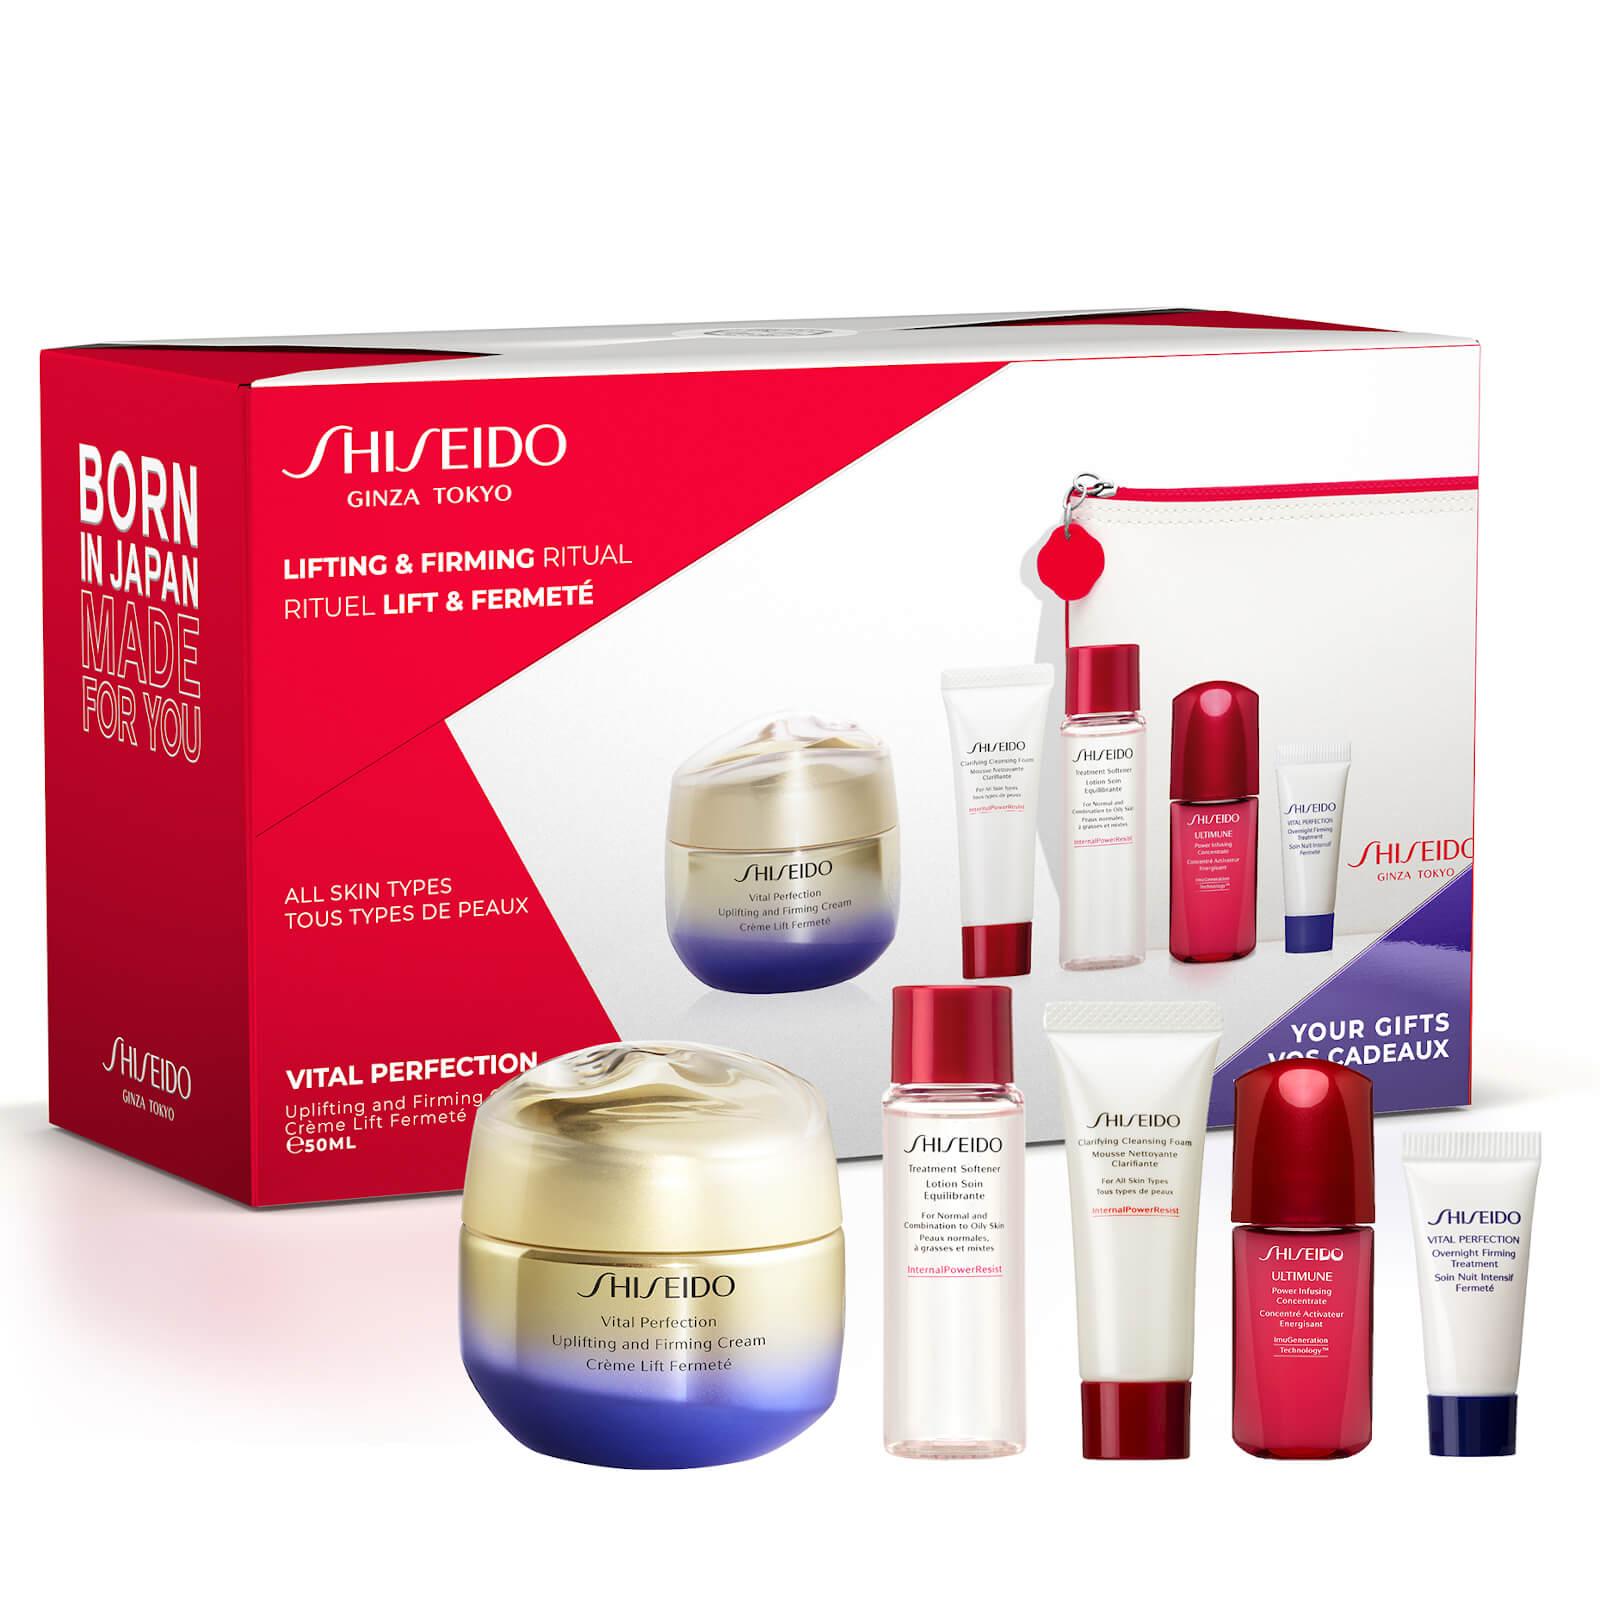 Купить Shiseido Vital Perfection Uplifting and Firming Cream Pouch Set